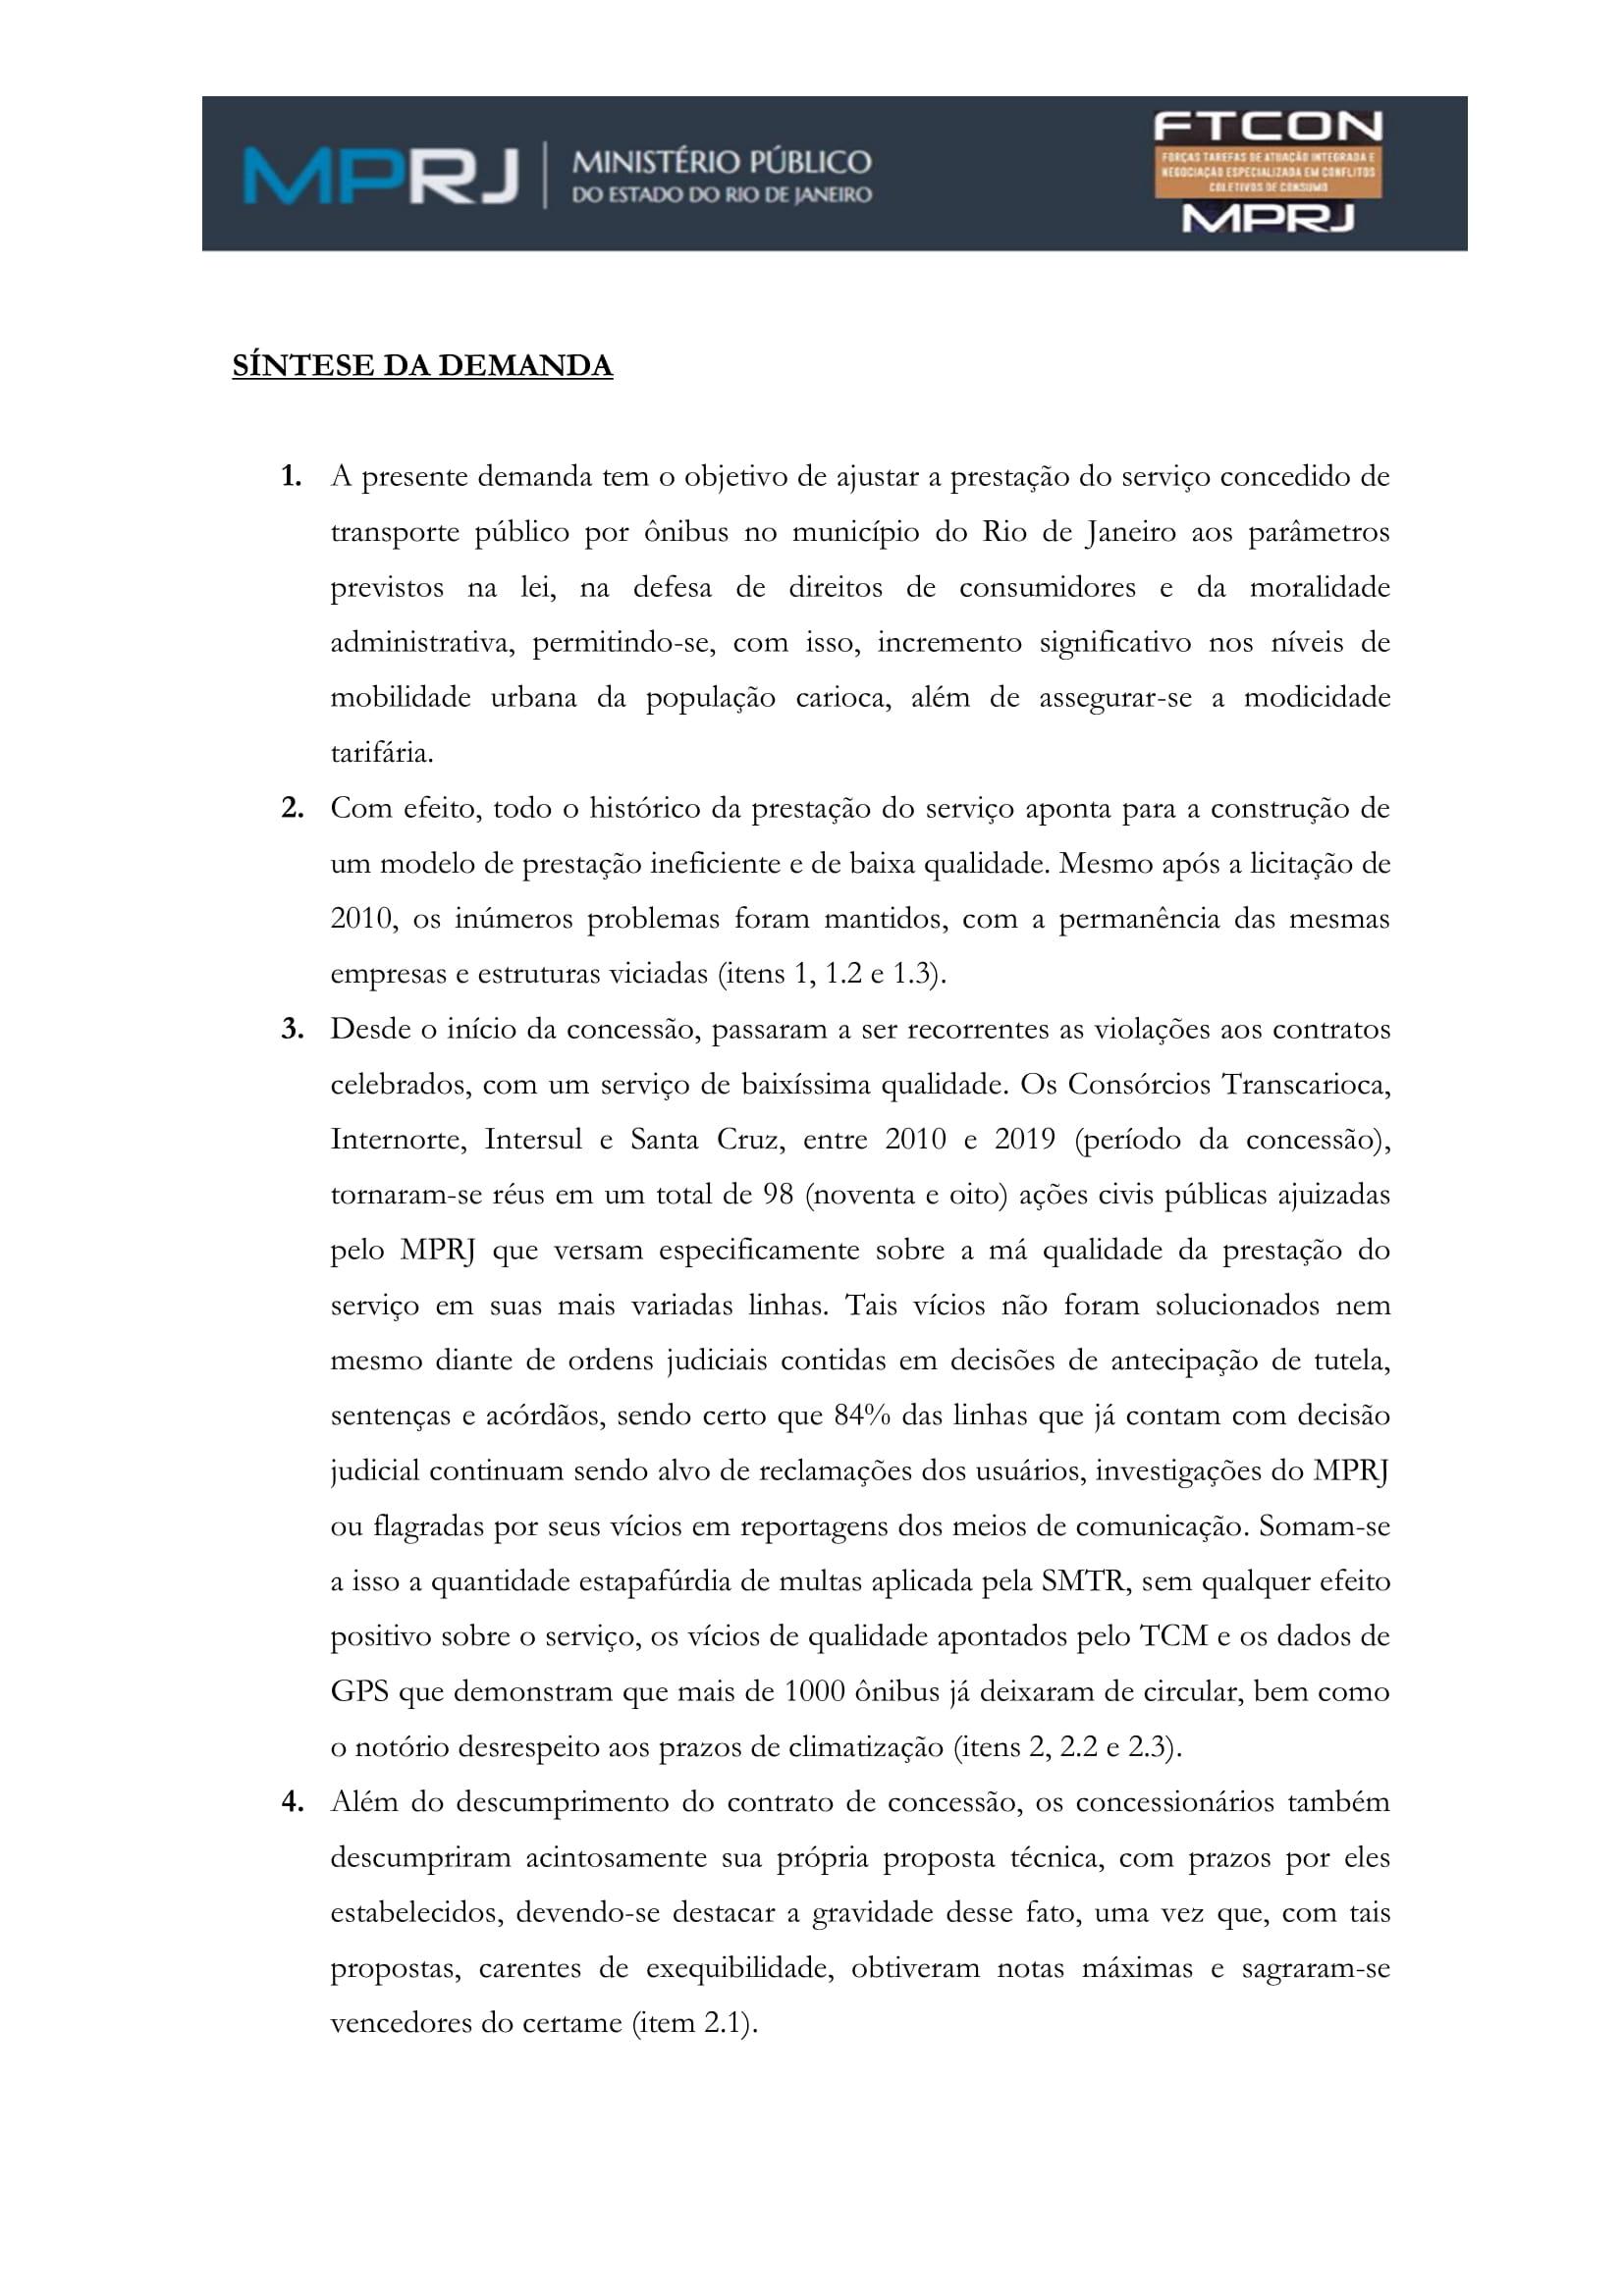 acp_caducidade_onibus_dr_rt-002